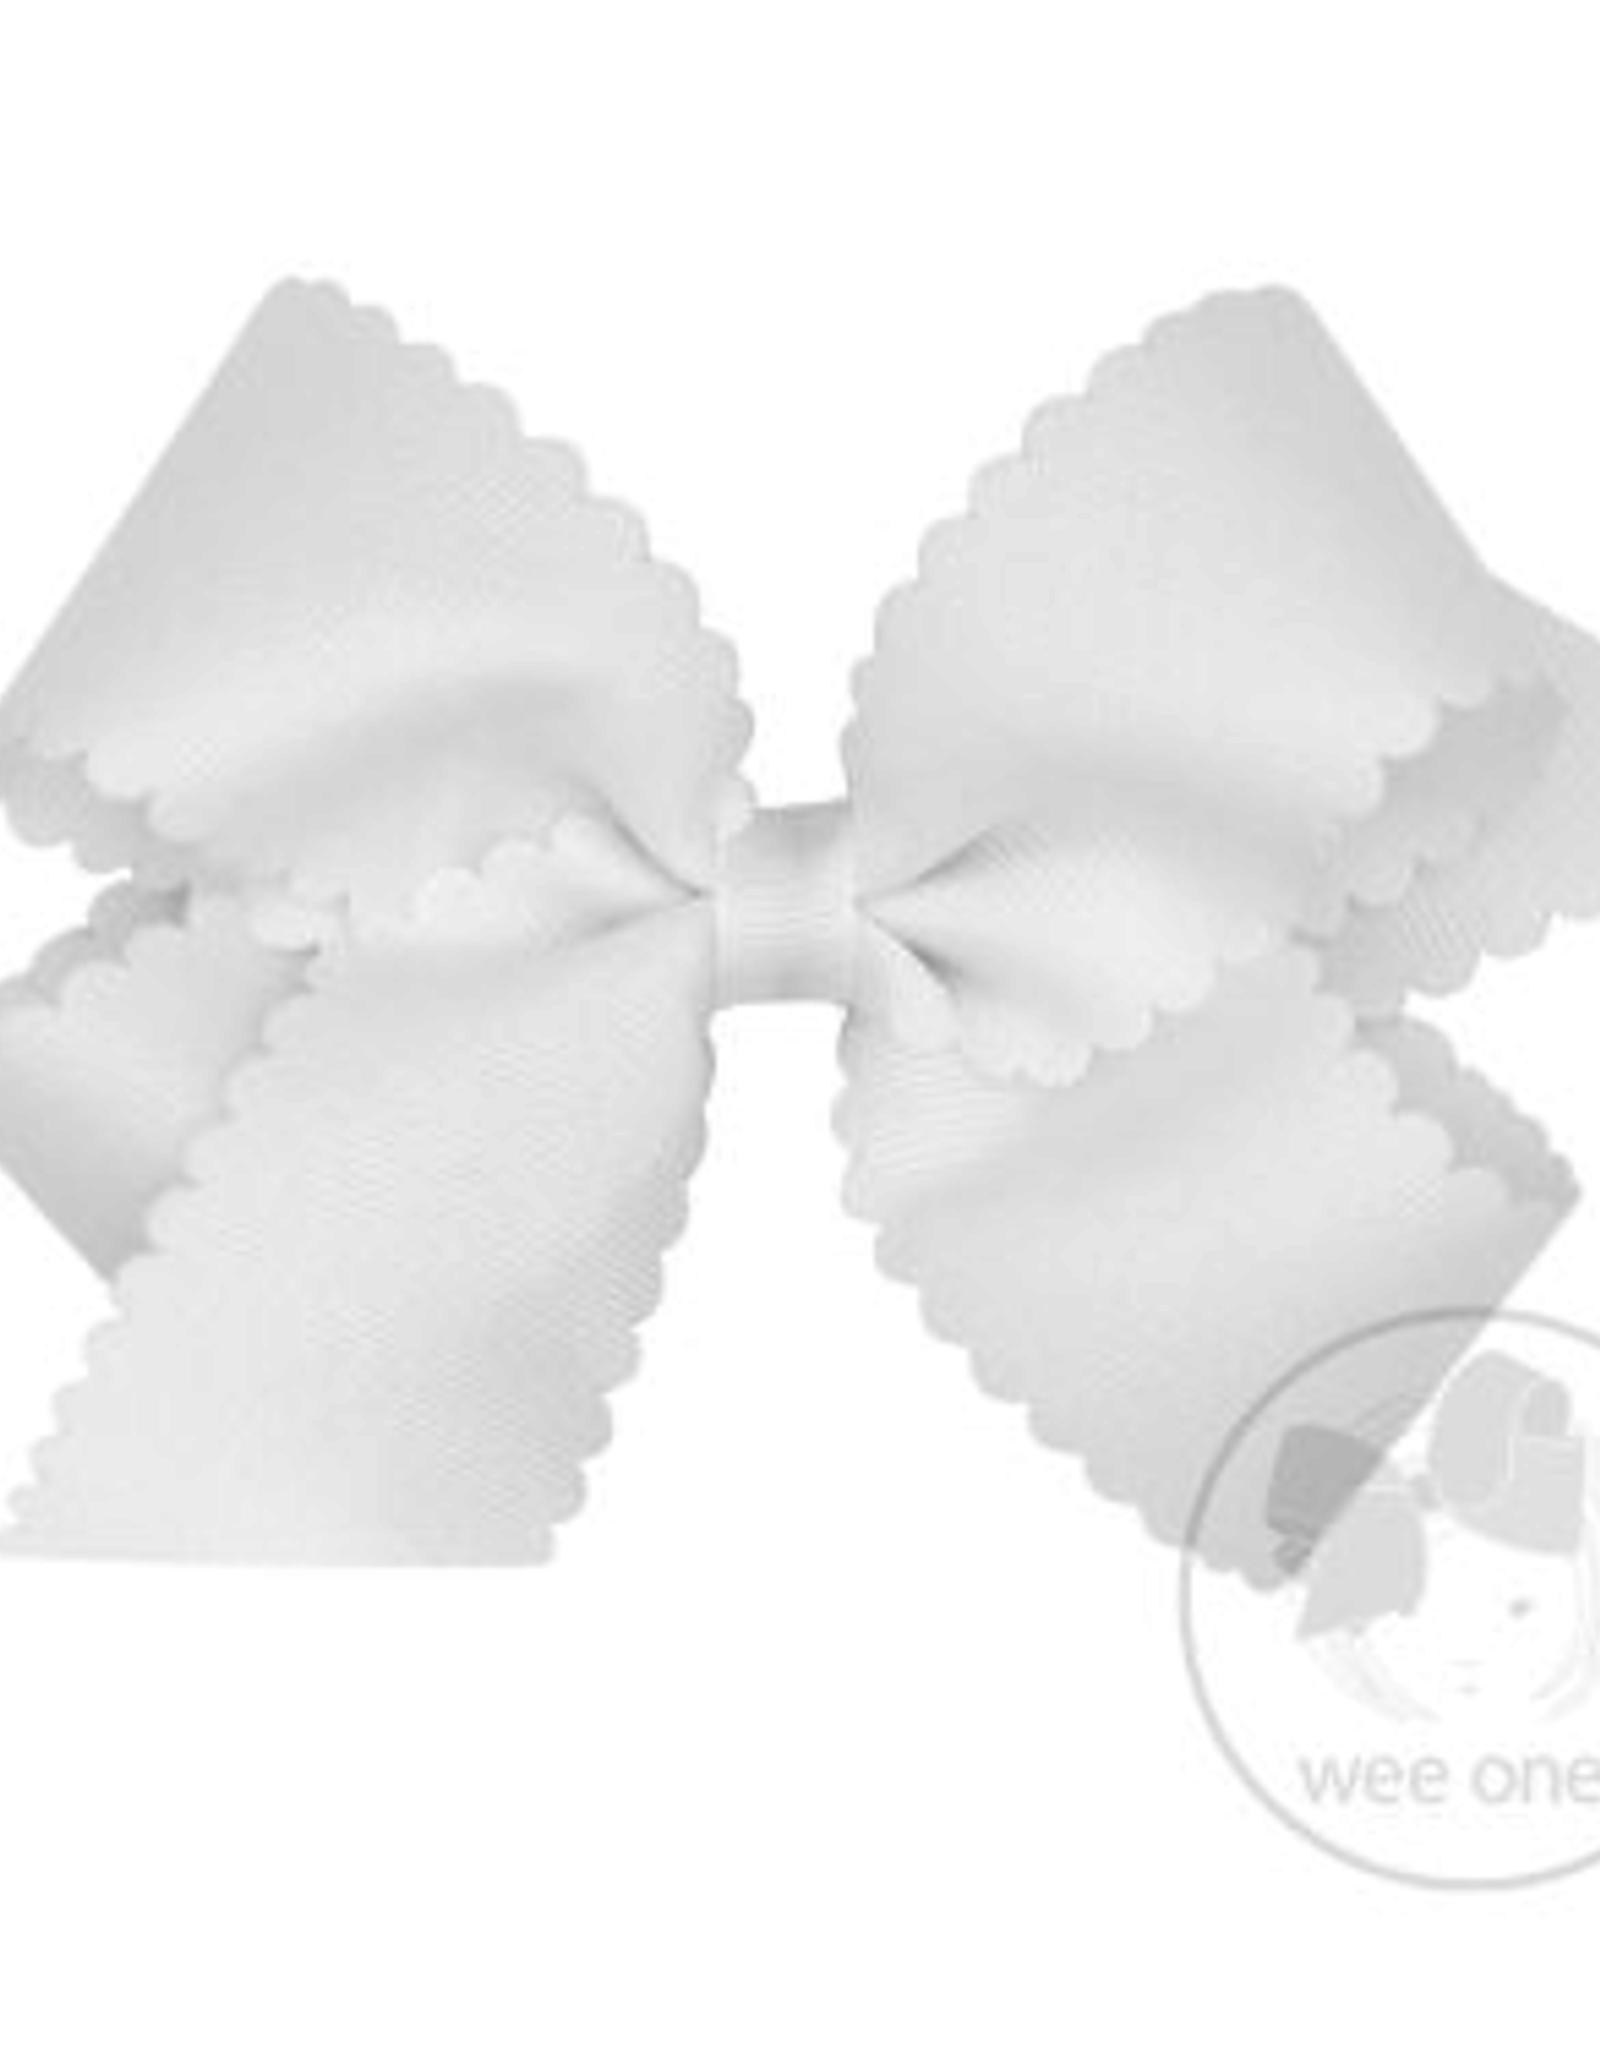 Wee Ones Medium Scalloped Edge Grosgrain Bow